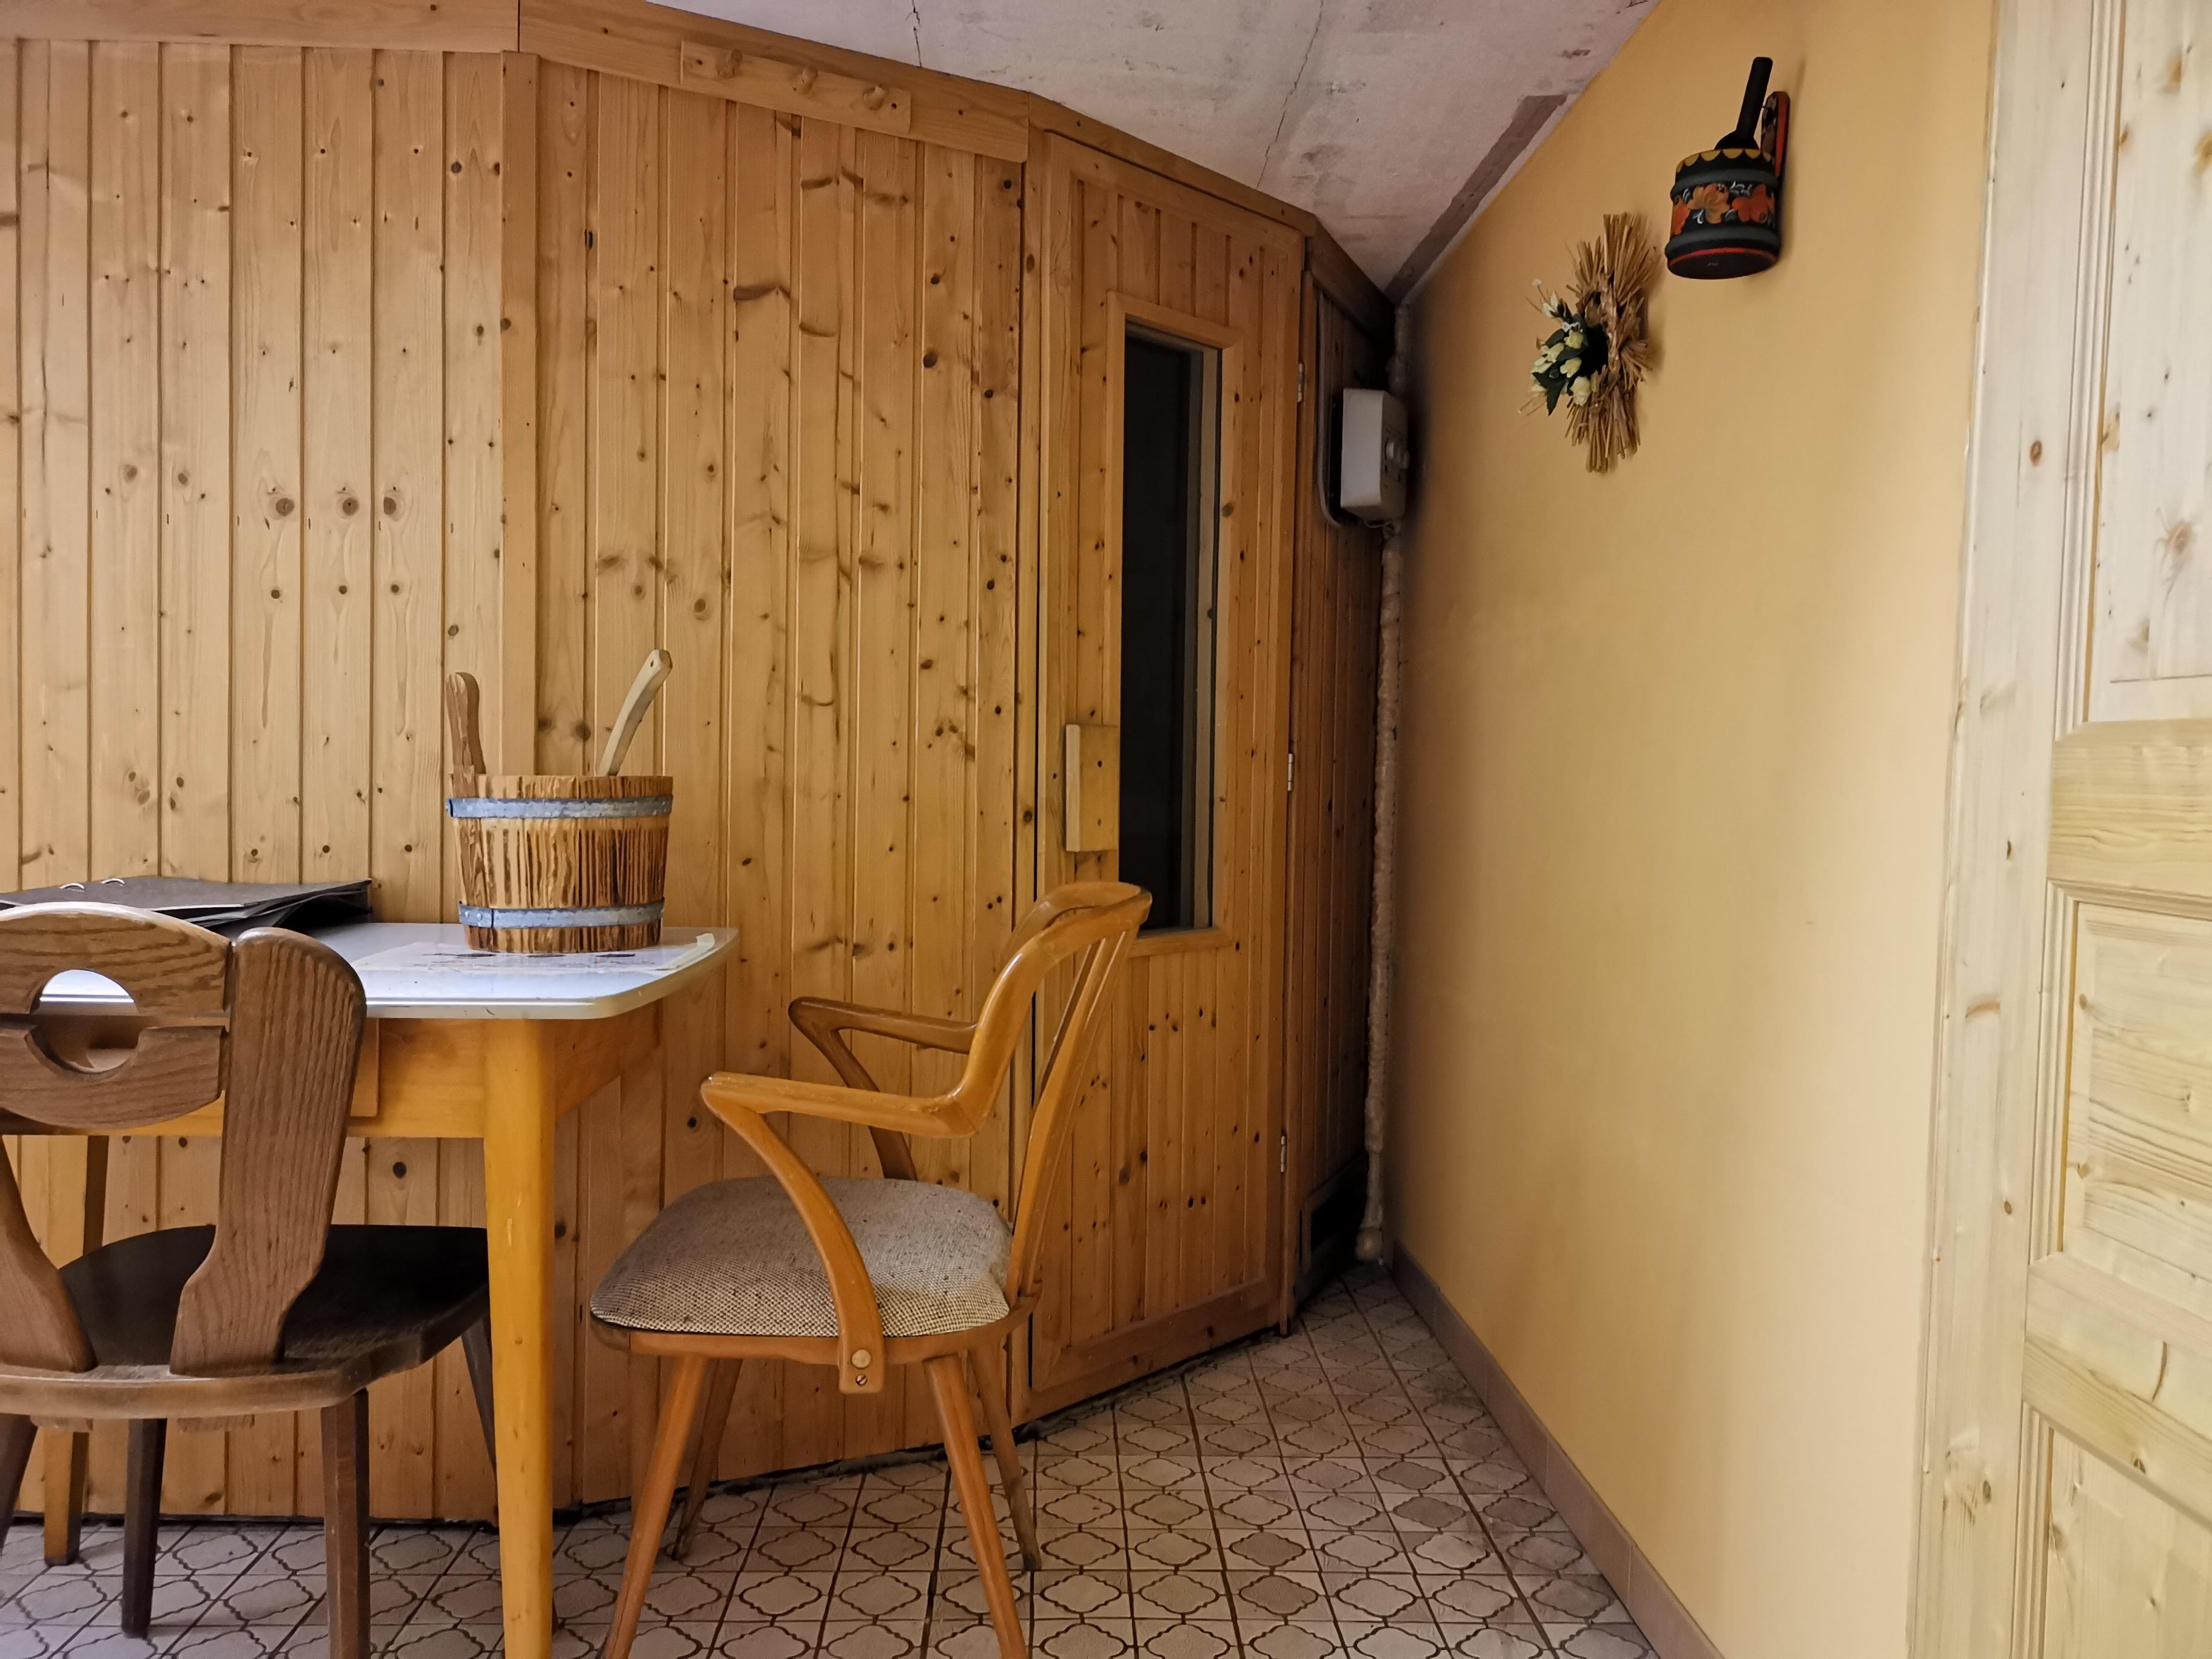 Sauna im Keller: